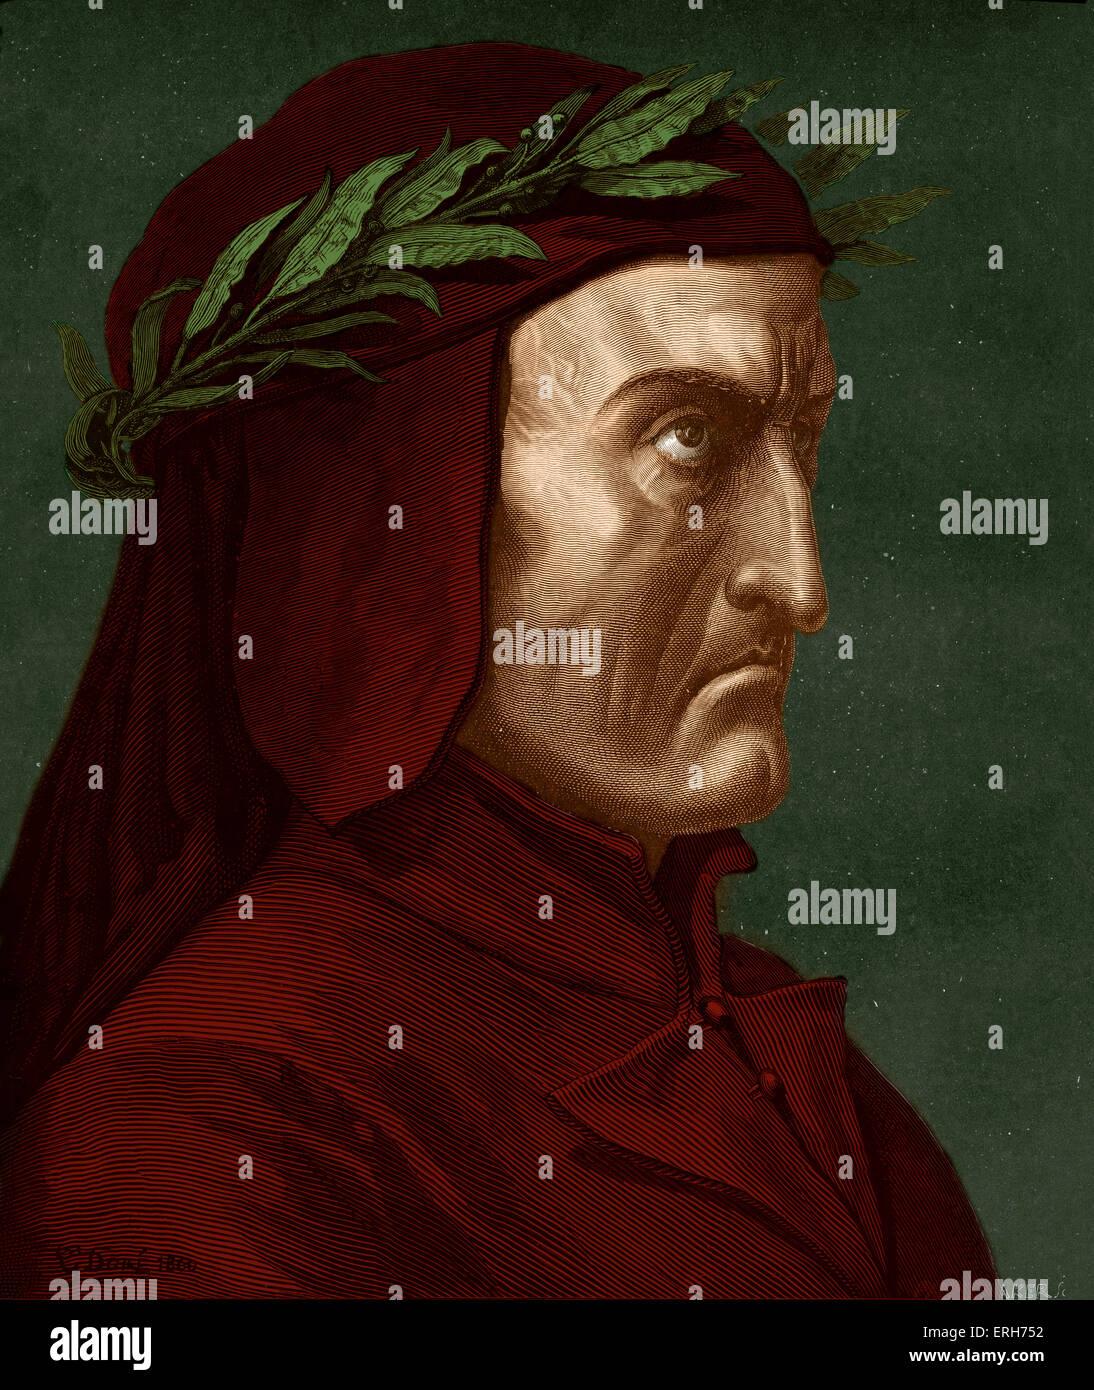 Dante Alighieri, profile portrait with laurel wreath.  Italian poet, 1265-1321. Stock Photo